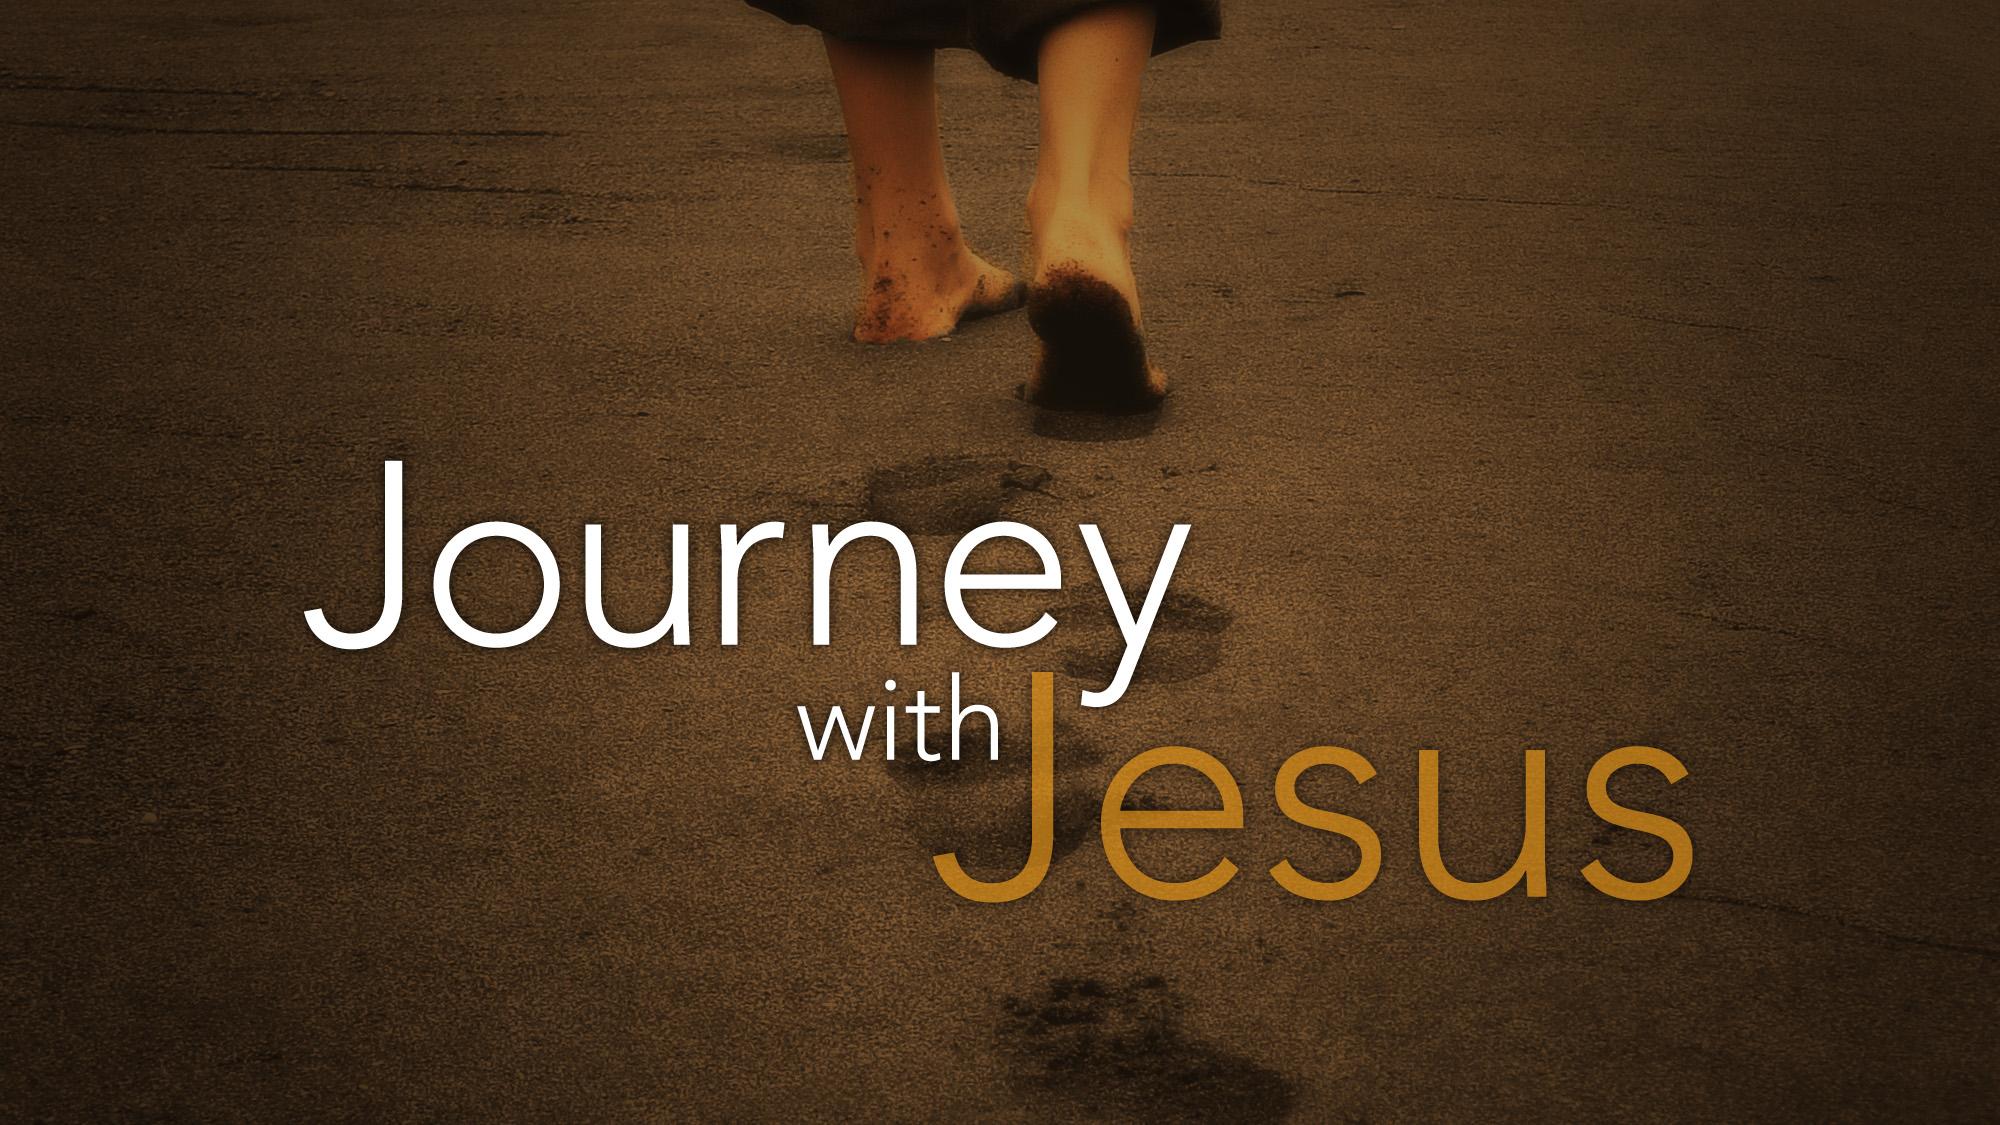 Journey with Jesus through John